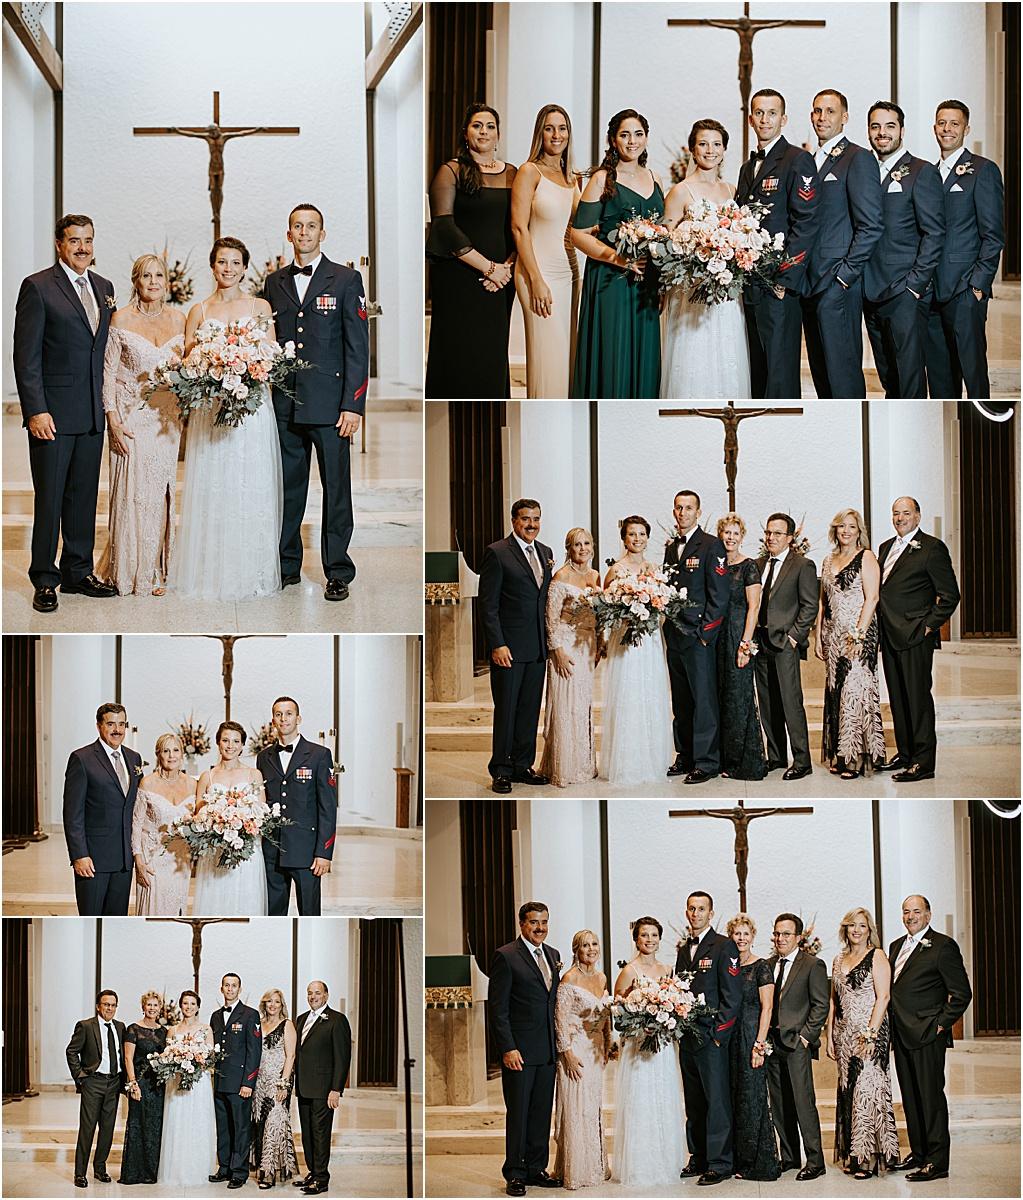 brittany_boote_pennsylvania_wedding_photographer_0624.jpg